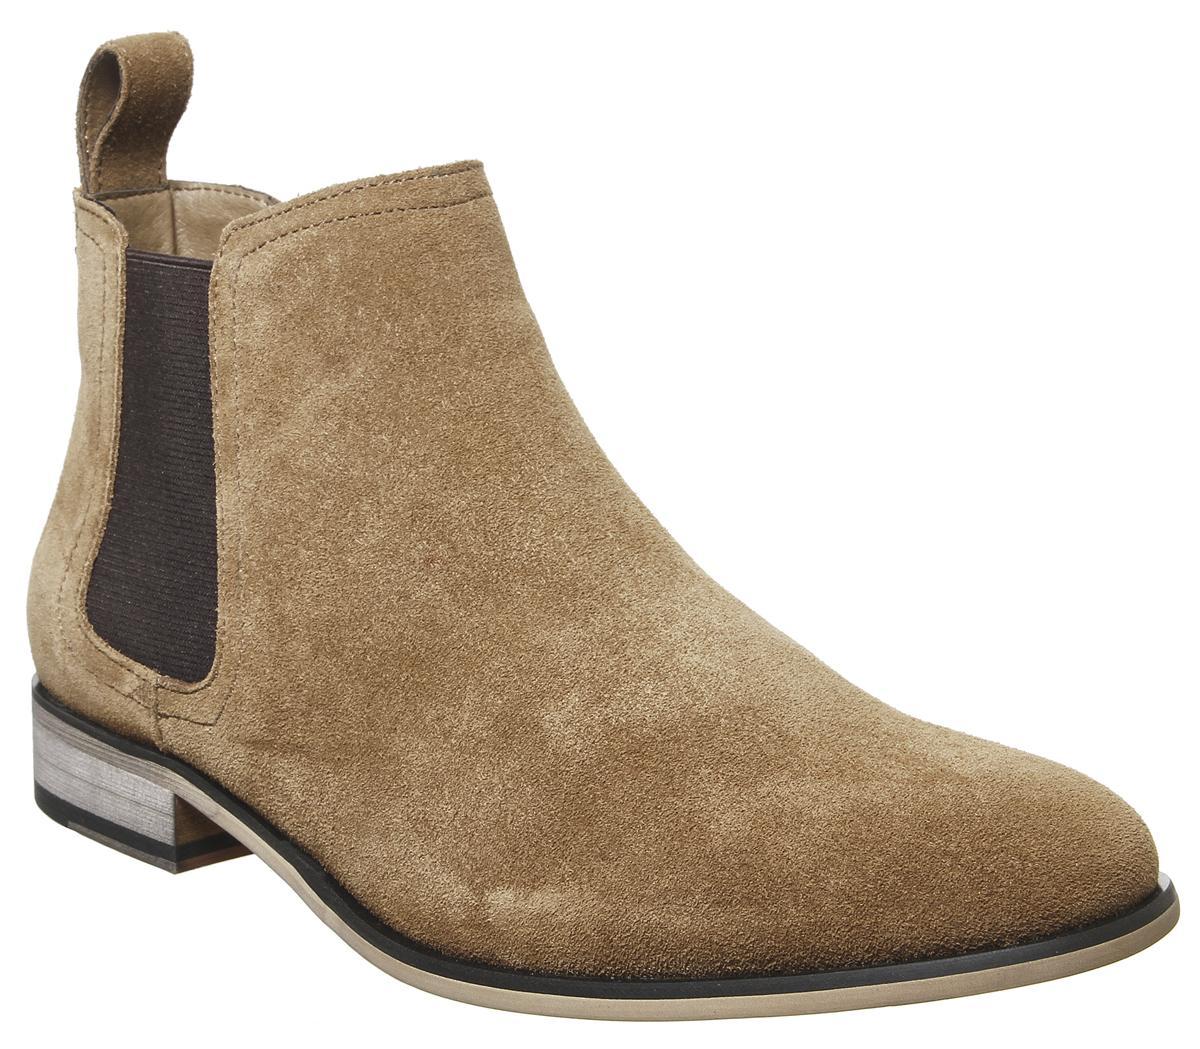 Barkley Chelsea Boots